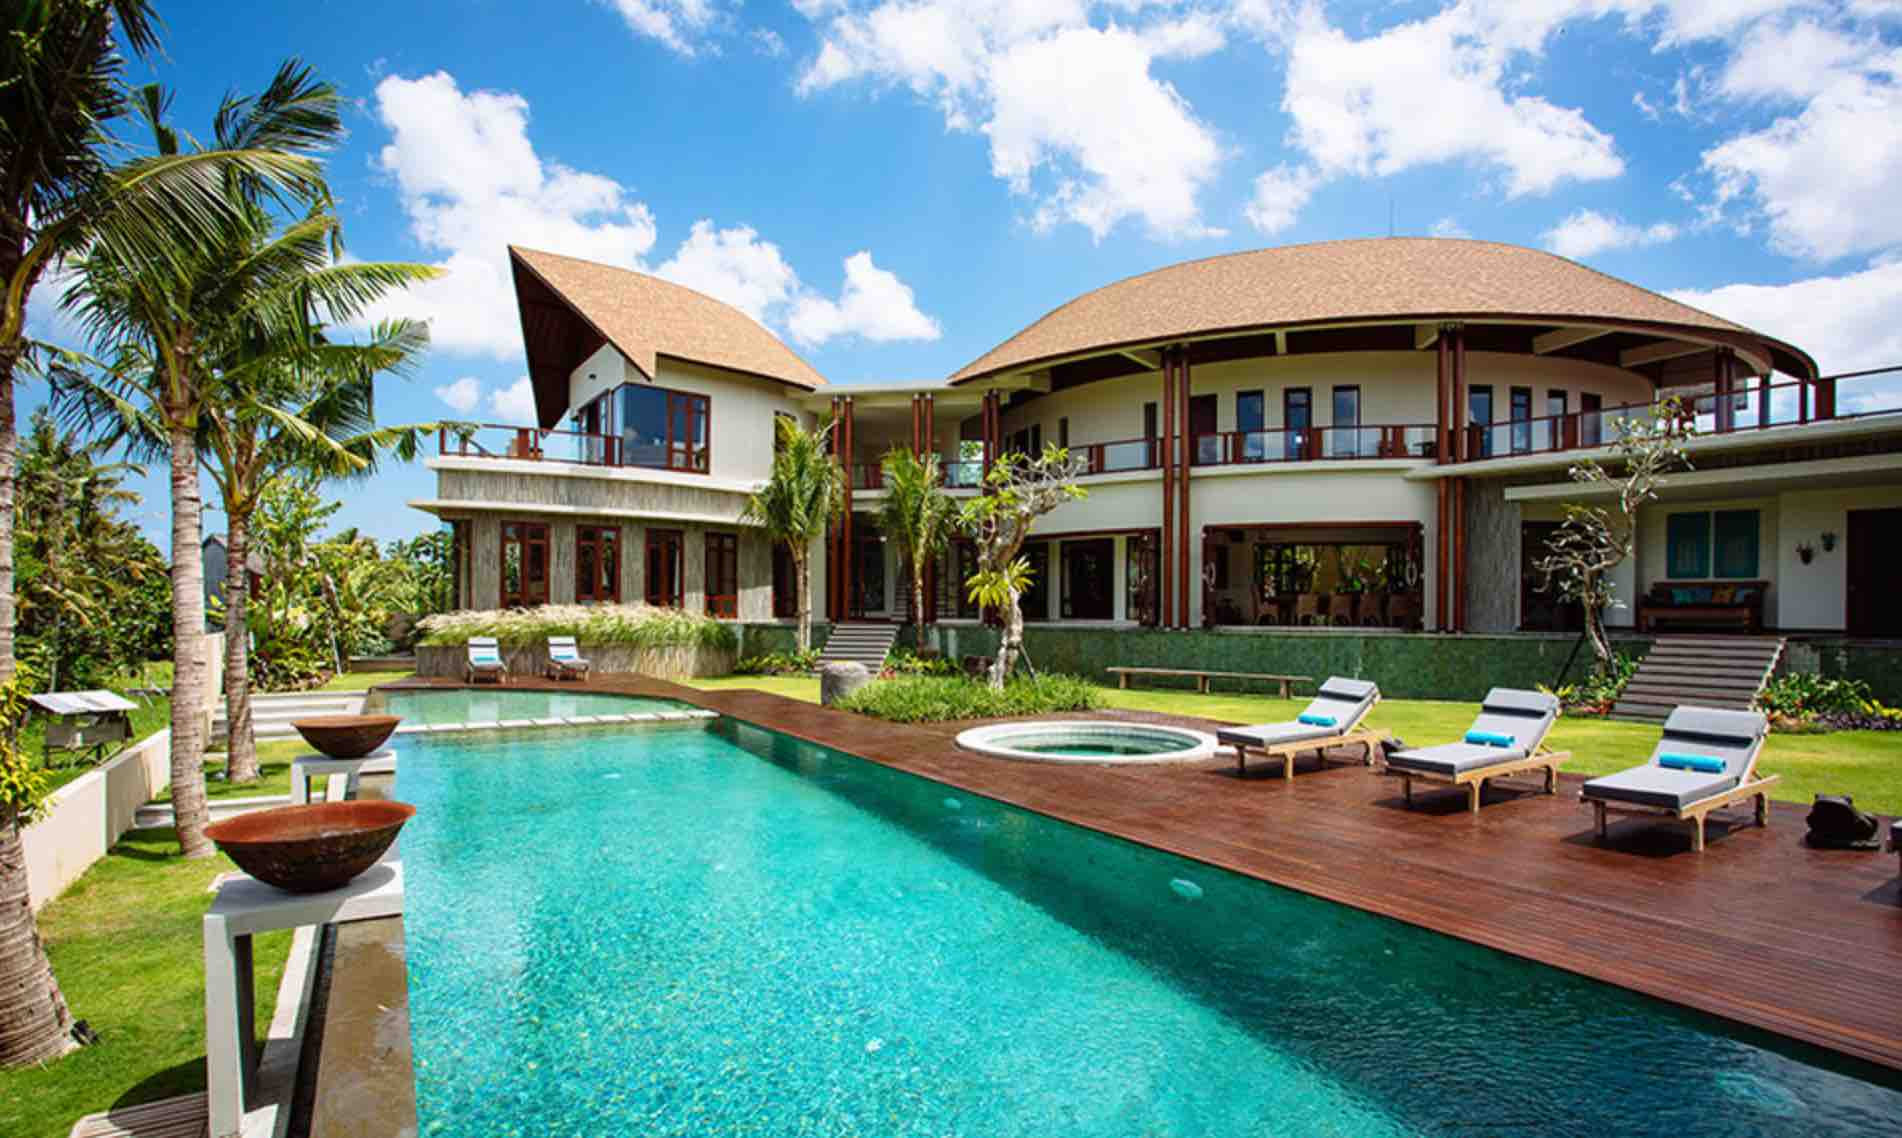 where to stay in bali - villa umah daun, umalas